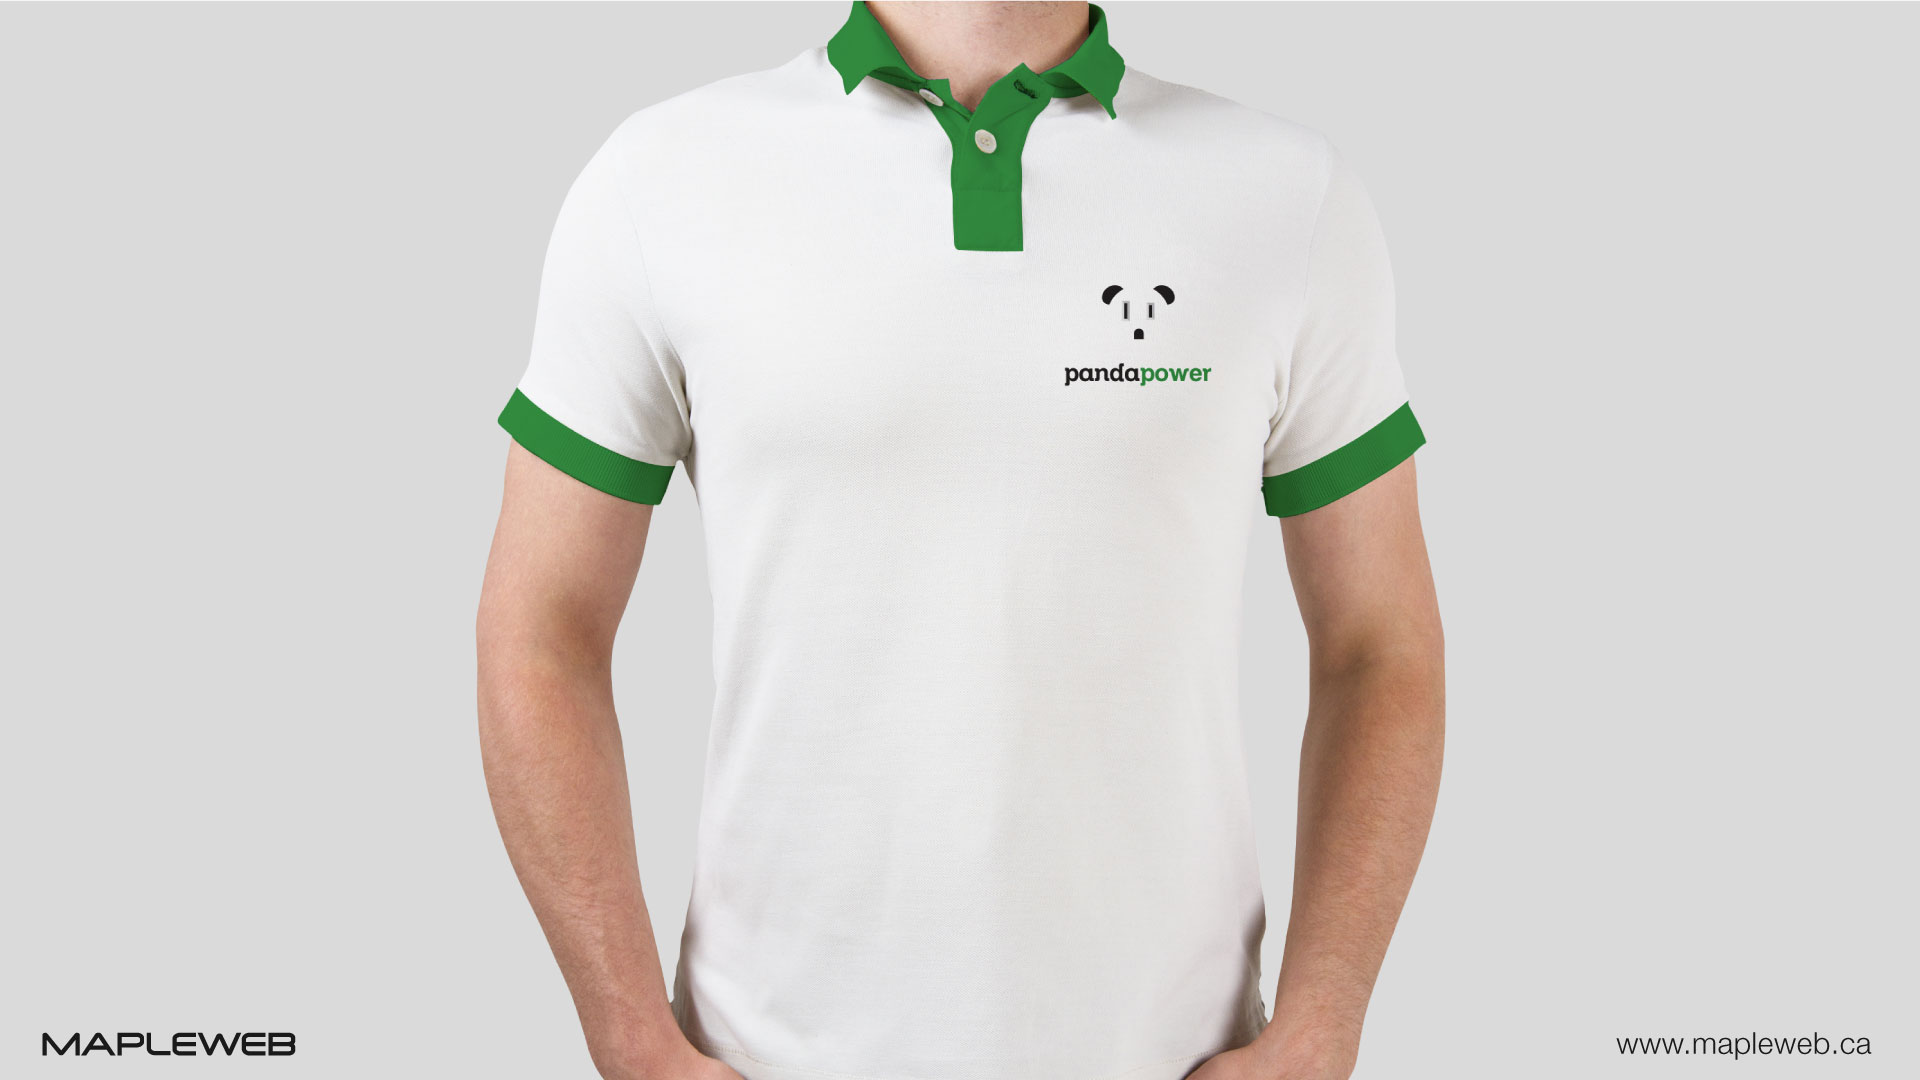 panda-power-design-by-mapleweb-vancouver-canada-tshirt-mock